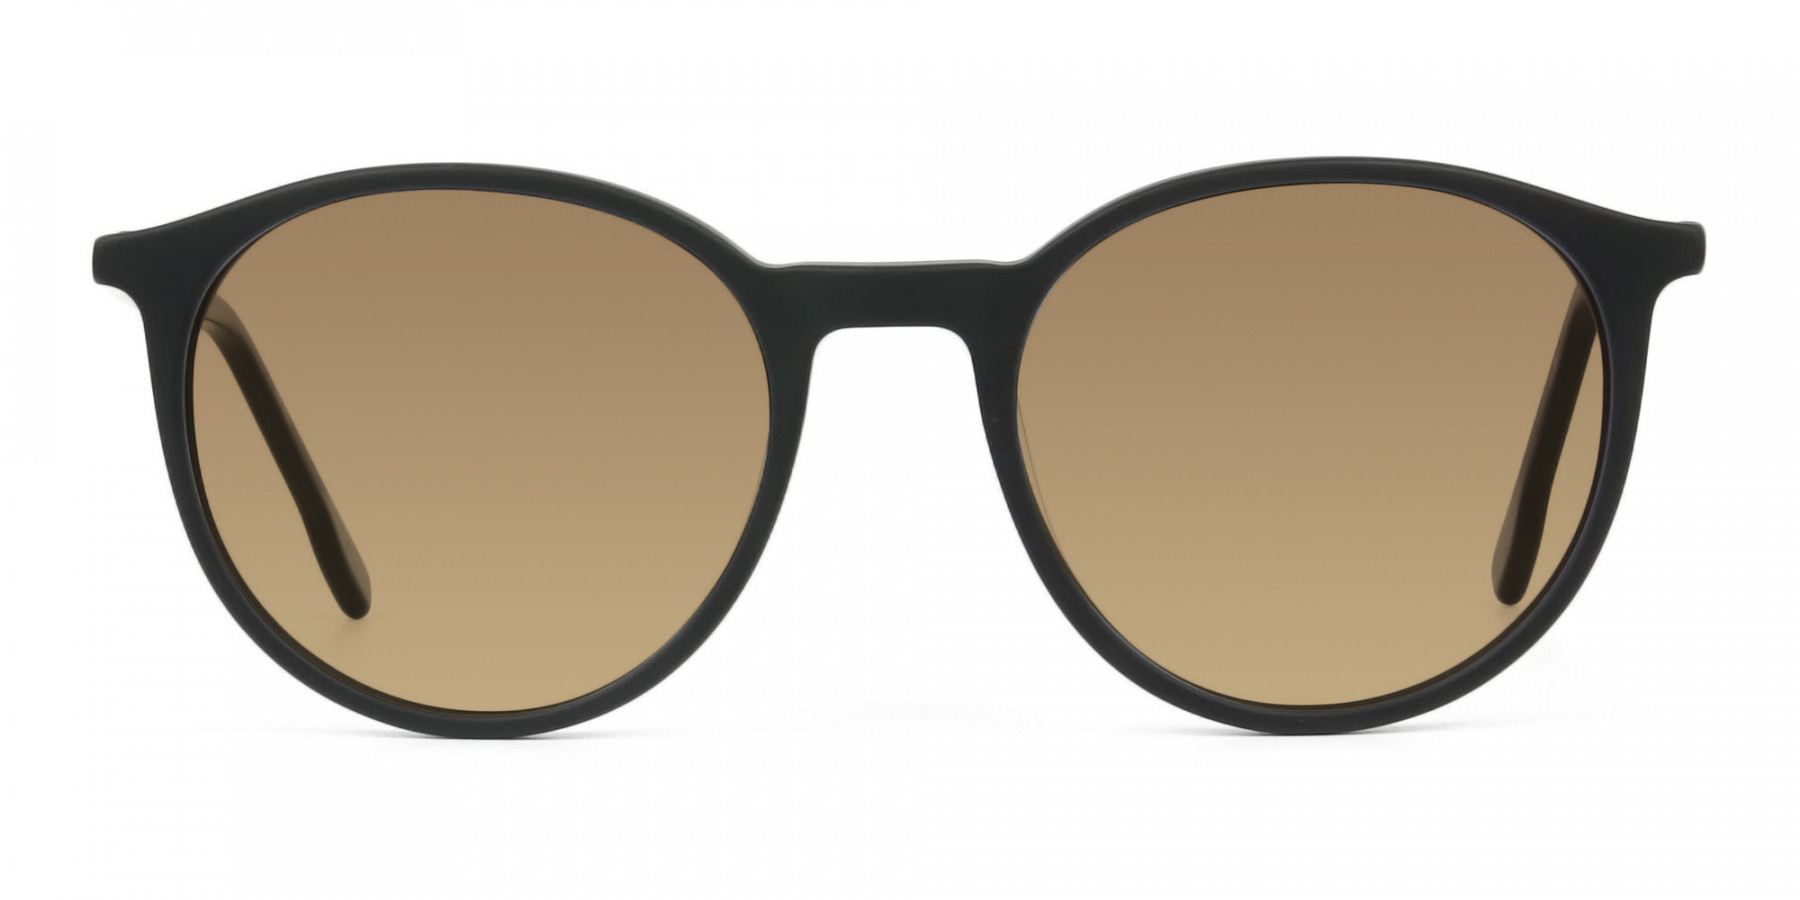 dark-brown-matte-black-sunglasses - 3